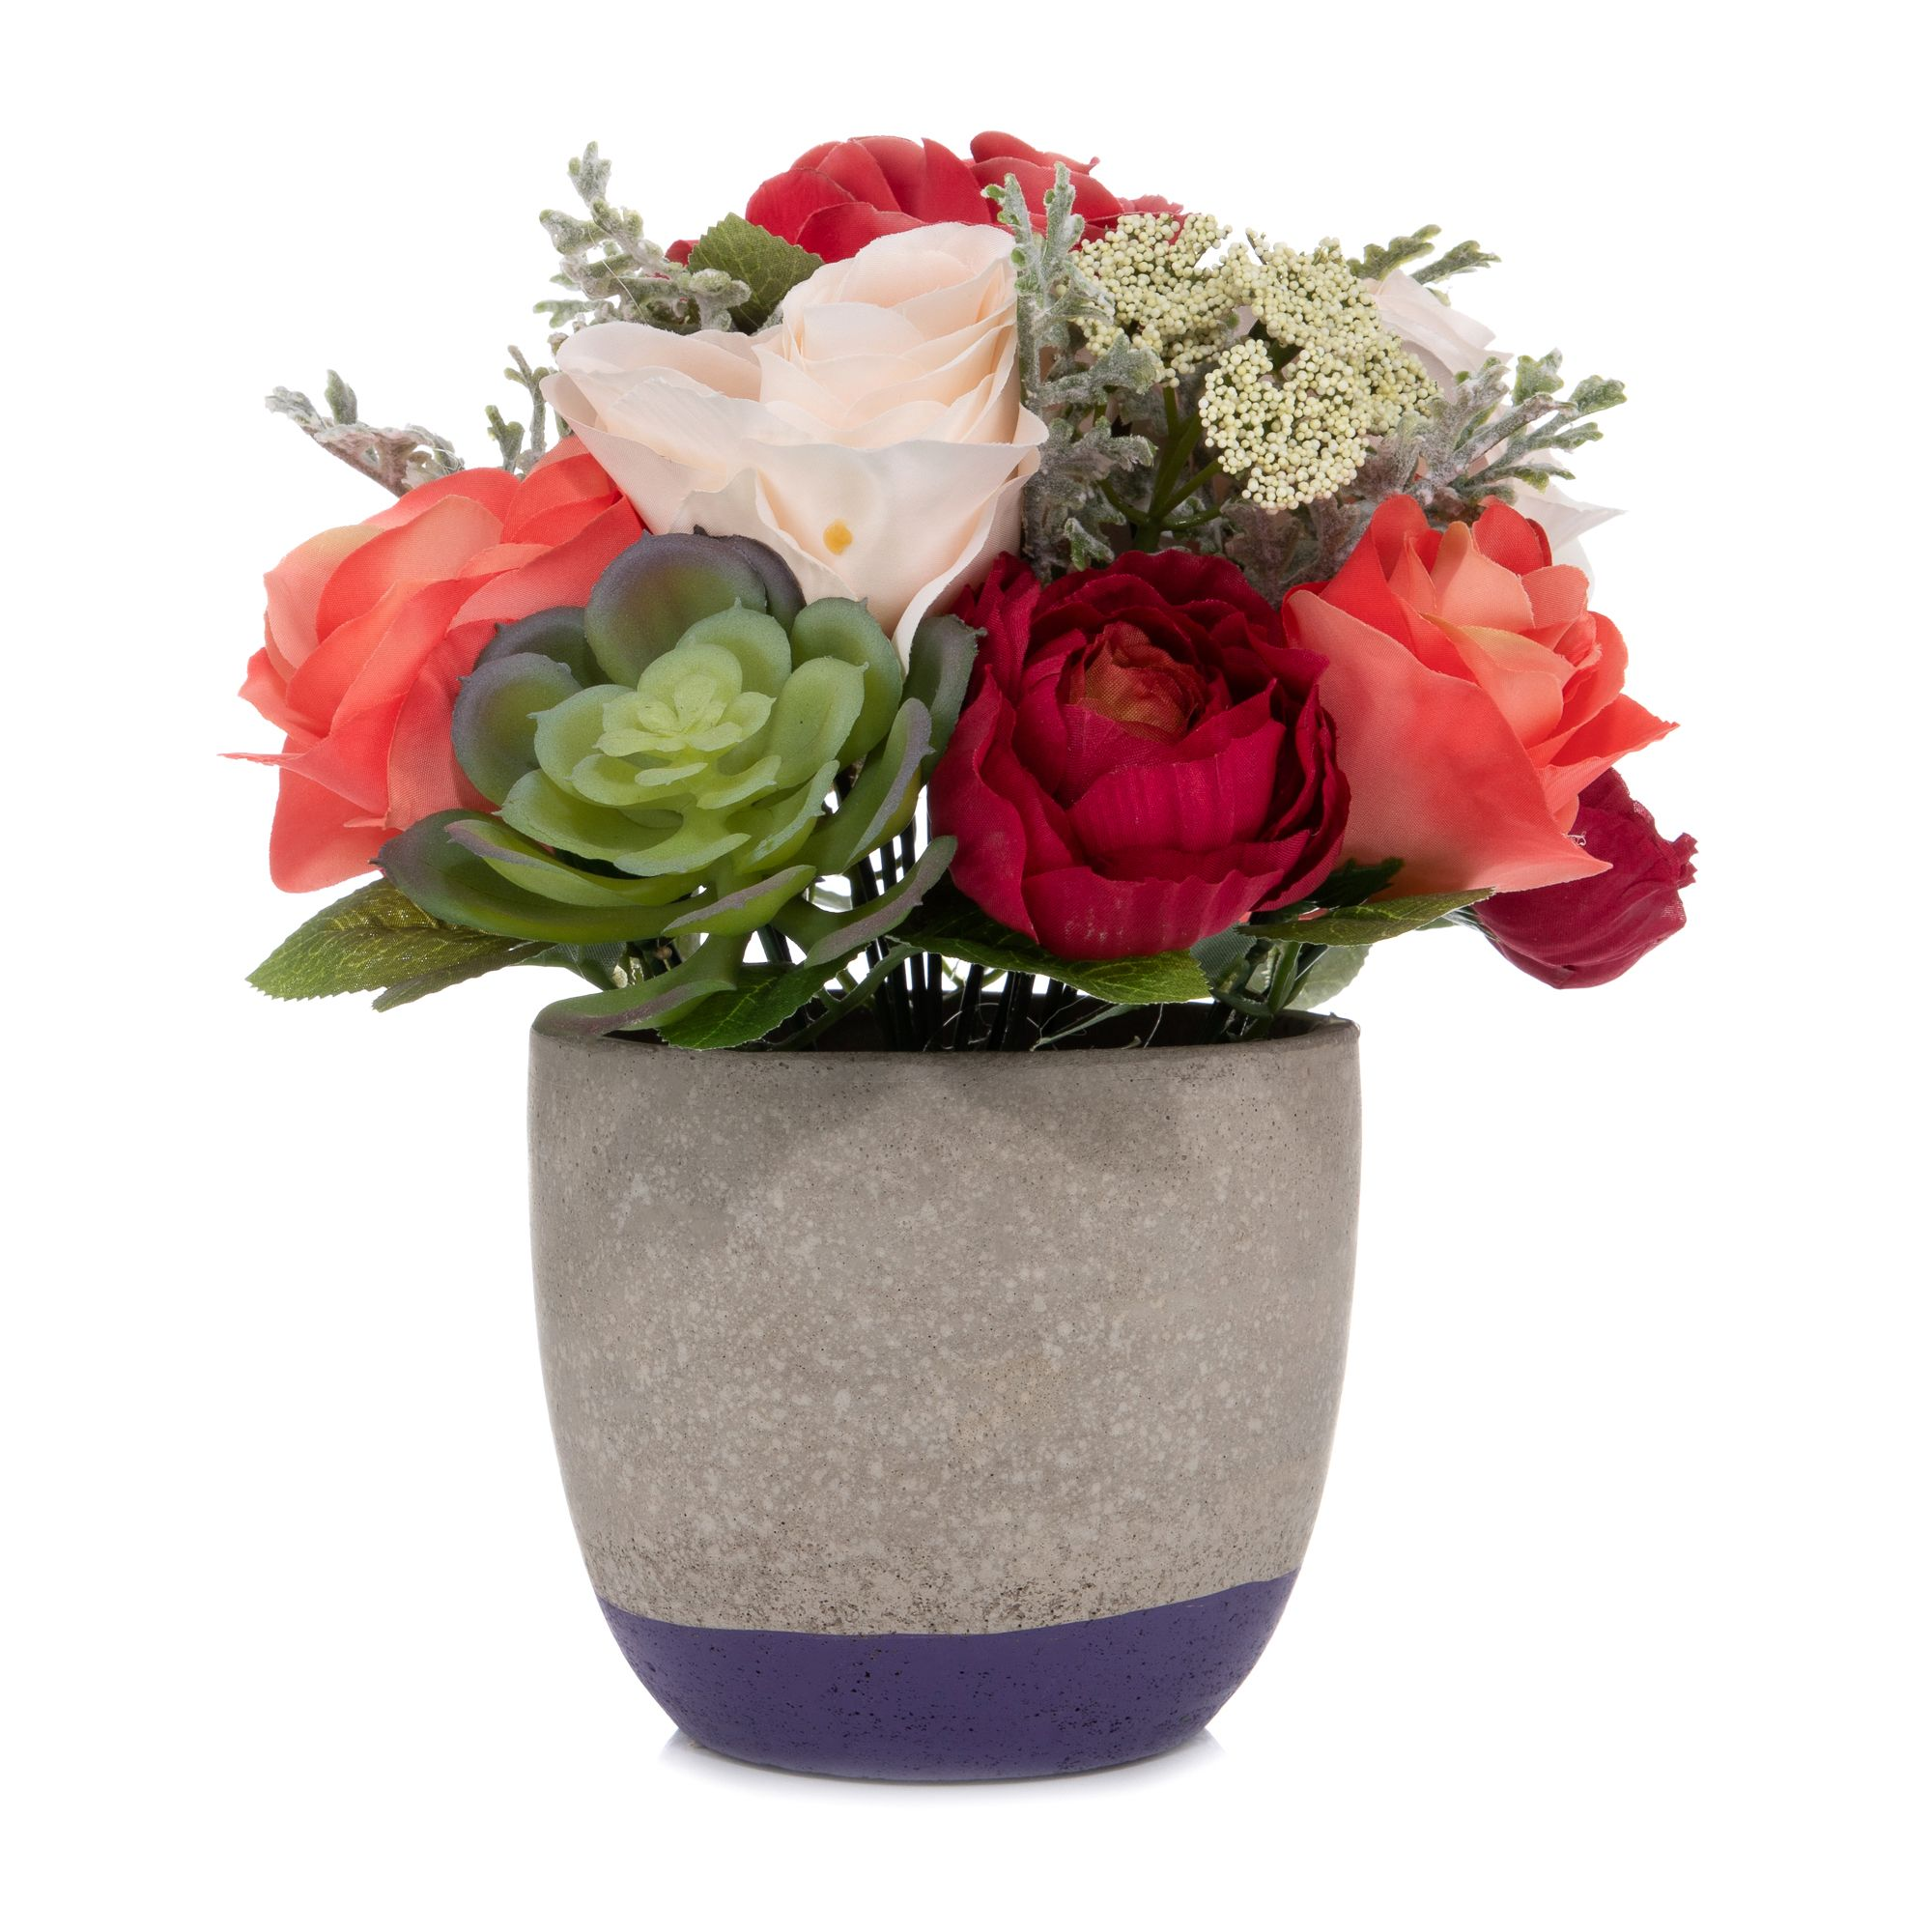 Abella Flora Kunstblumen Im Zementtopf Multicolor Höhe Ca 26cm Qvcde